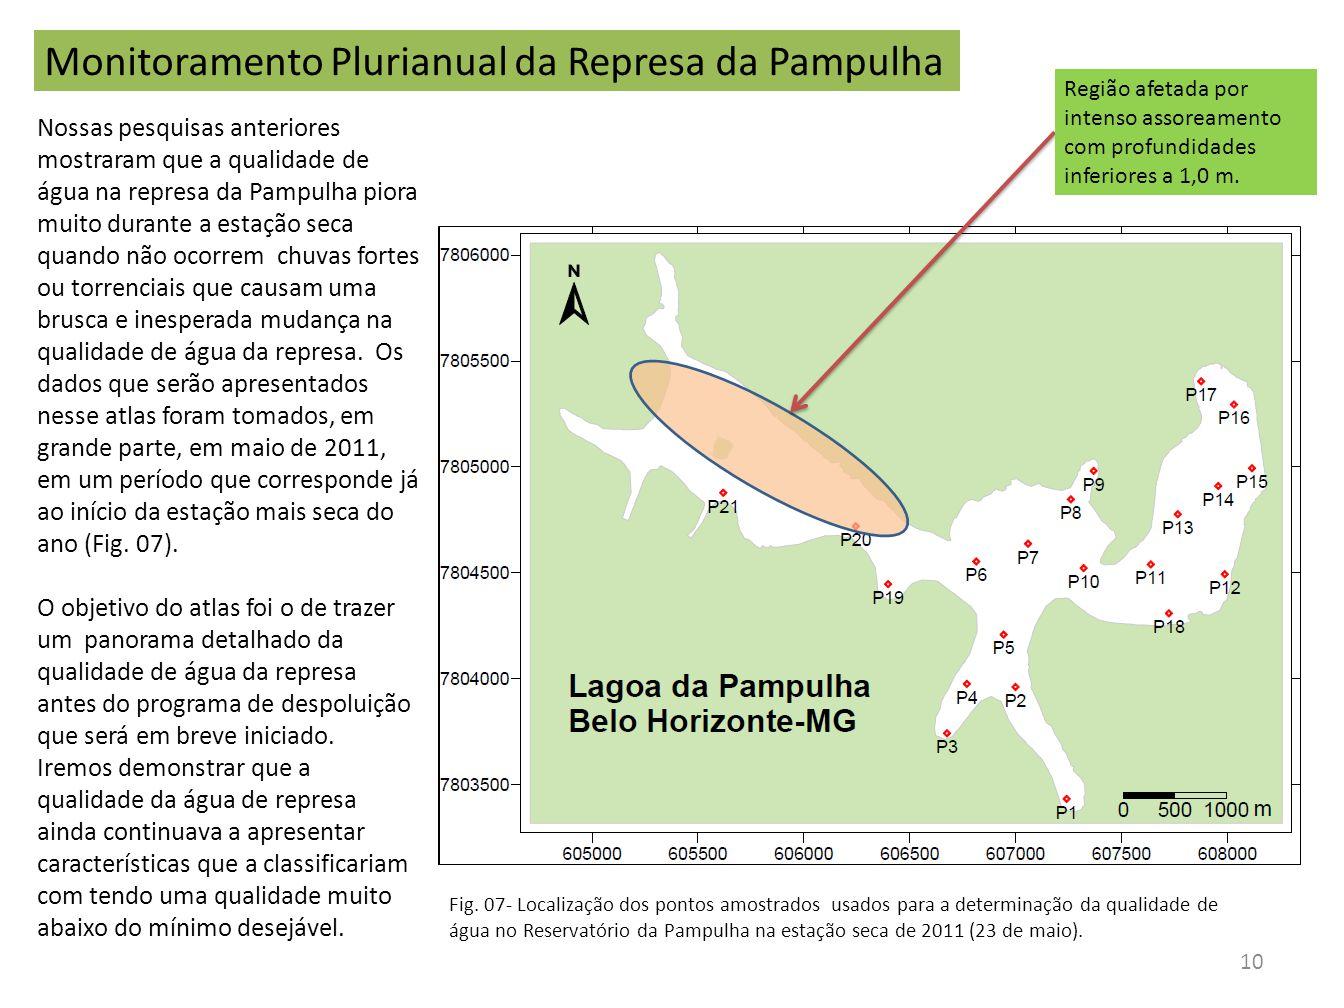 Monitoramento Plurianual da Represa da Pampulha